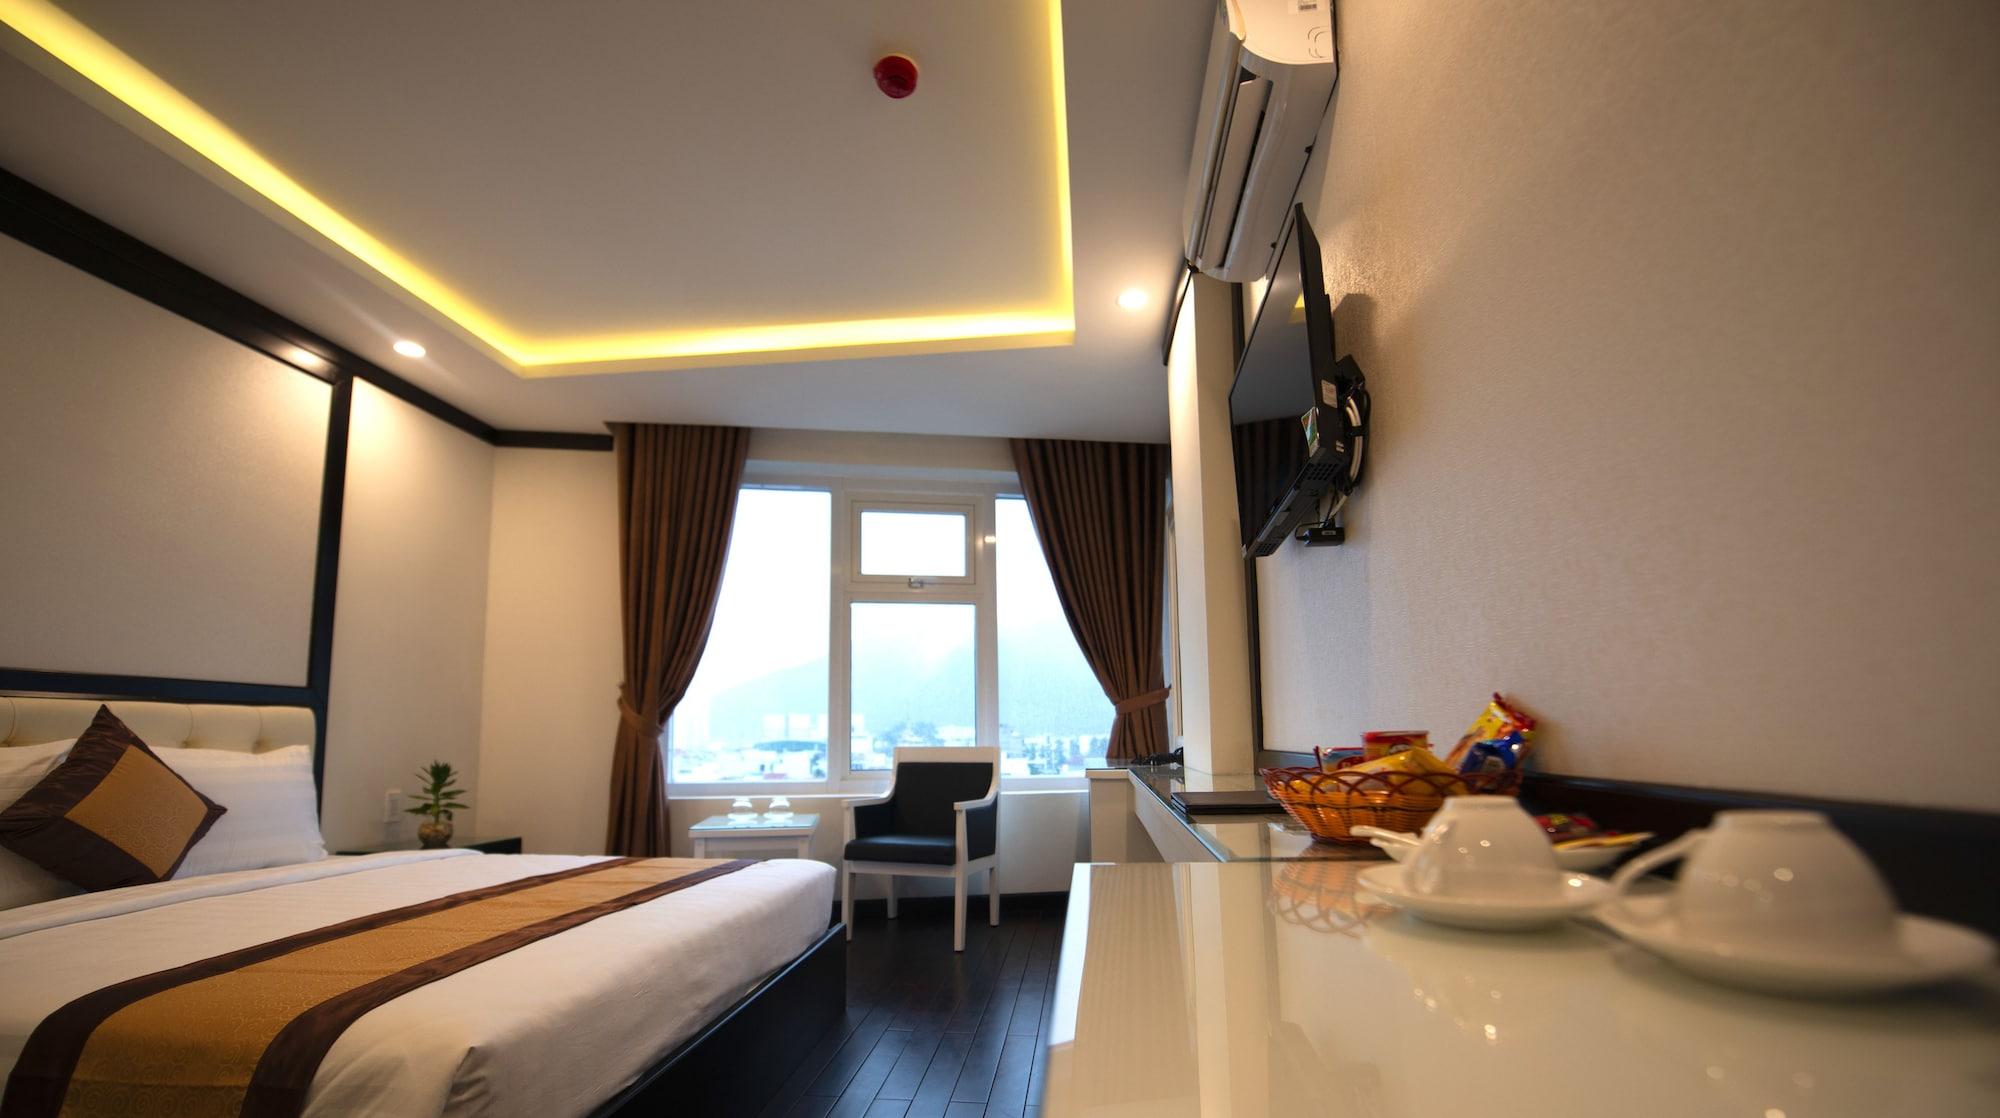 DHP Luxury Hotel, Nha Trang